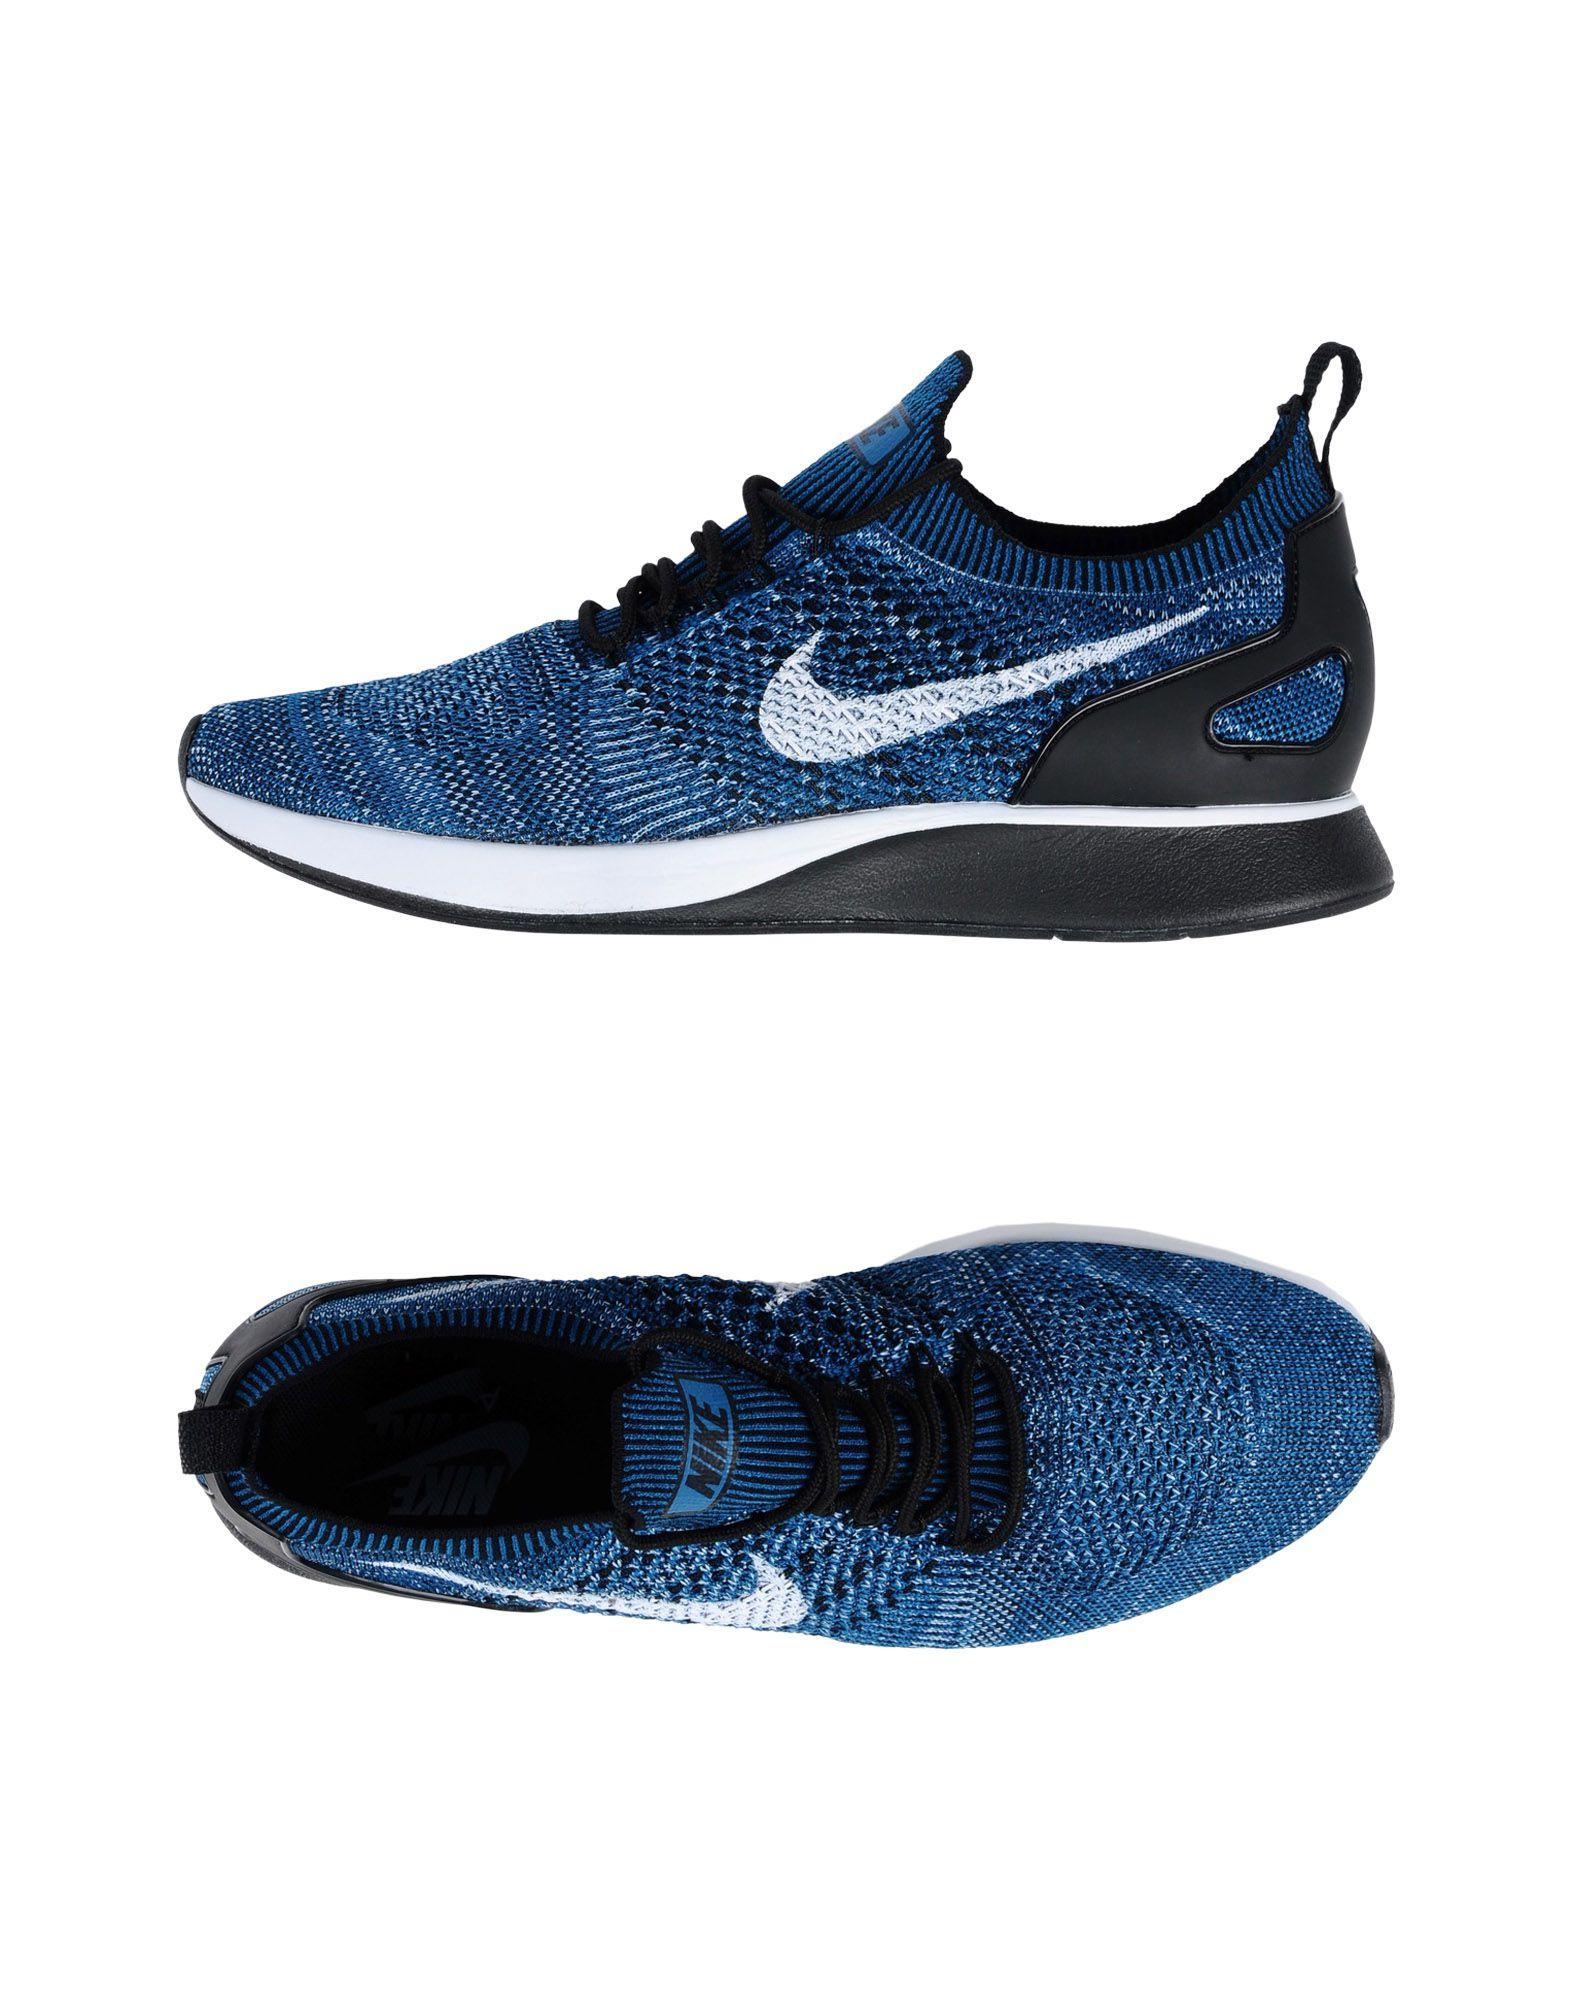 Sneakers Nike Air Zoom Mariah Flyknit Racer - Uomo - Acquista online su